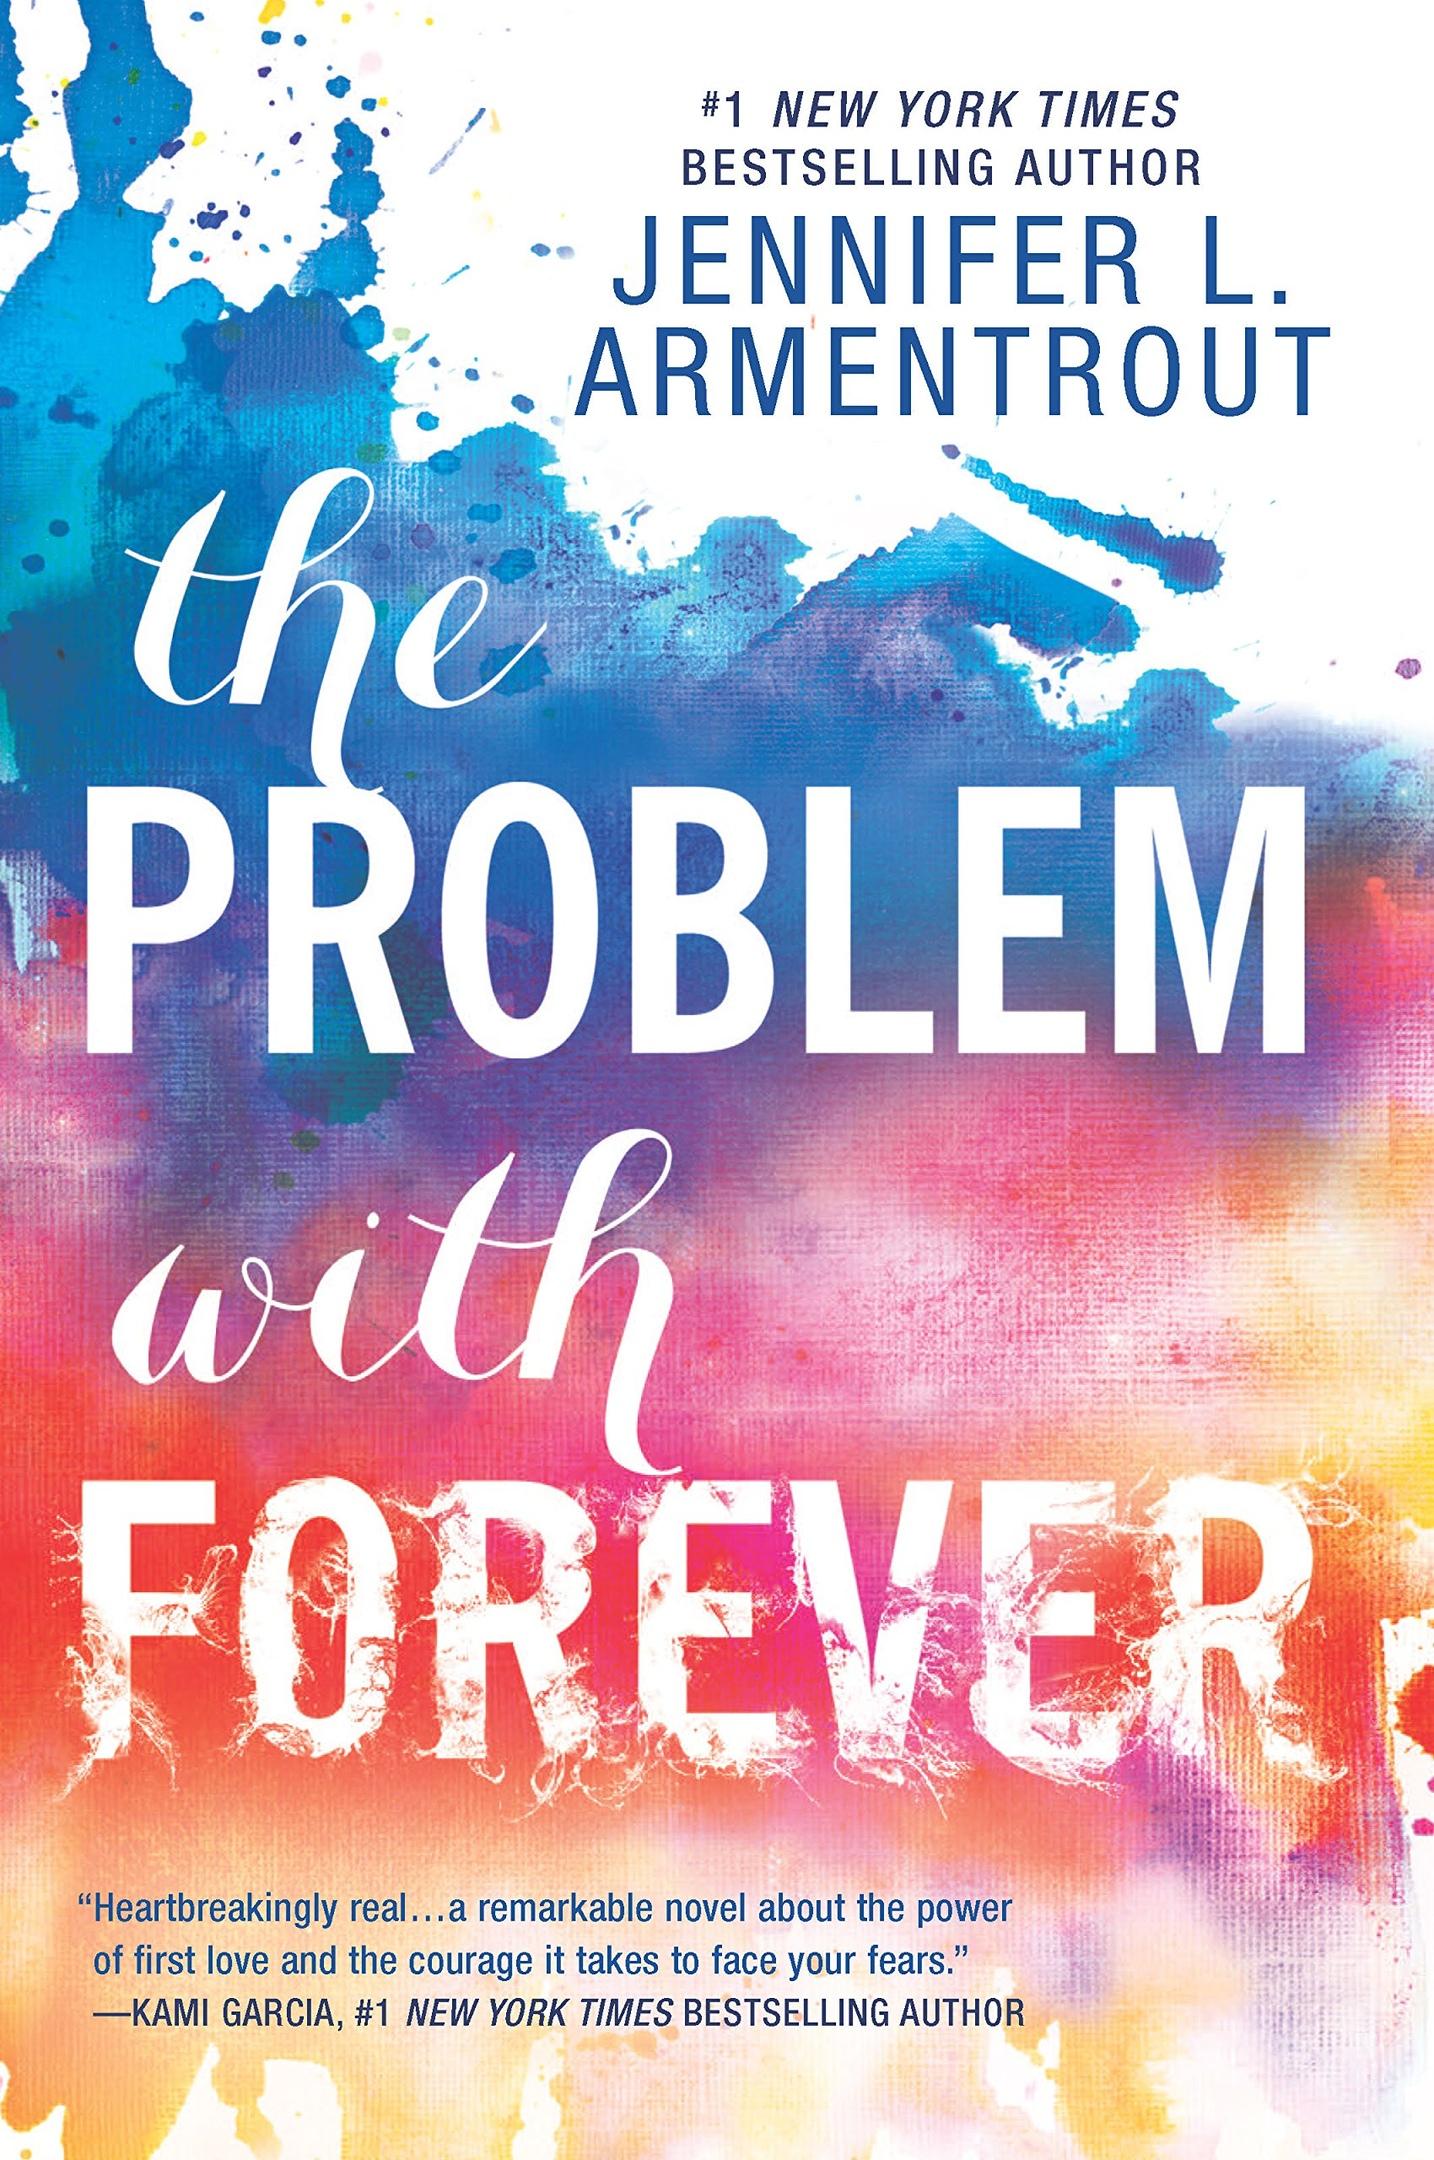 Jennifer L. Armentrout – The Problem With